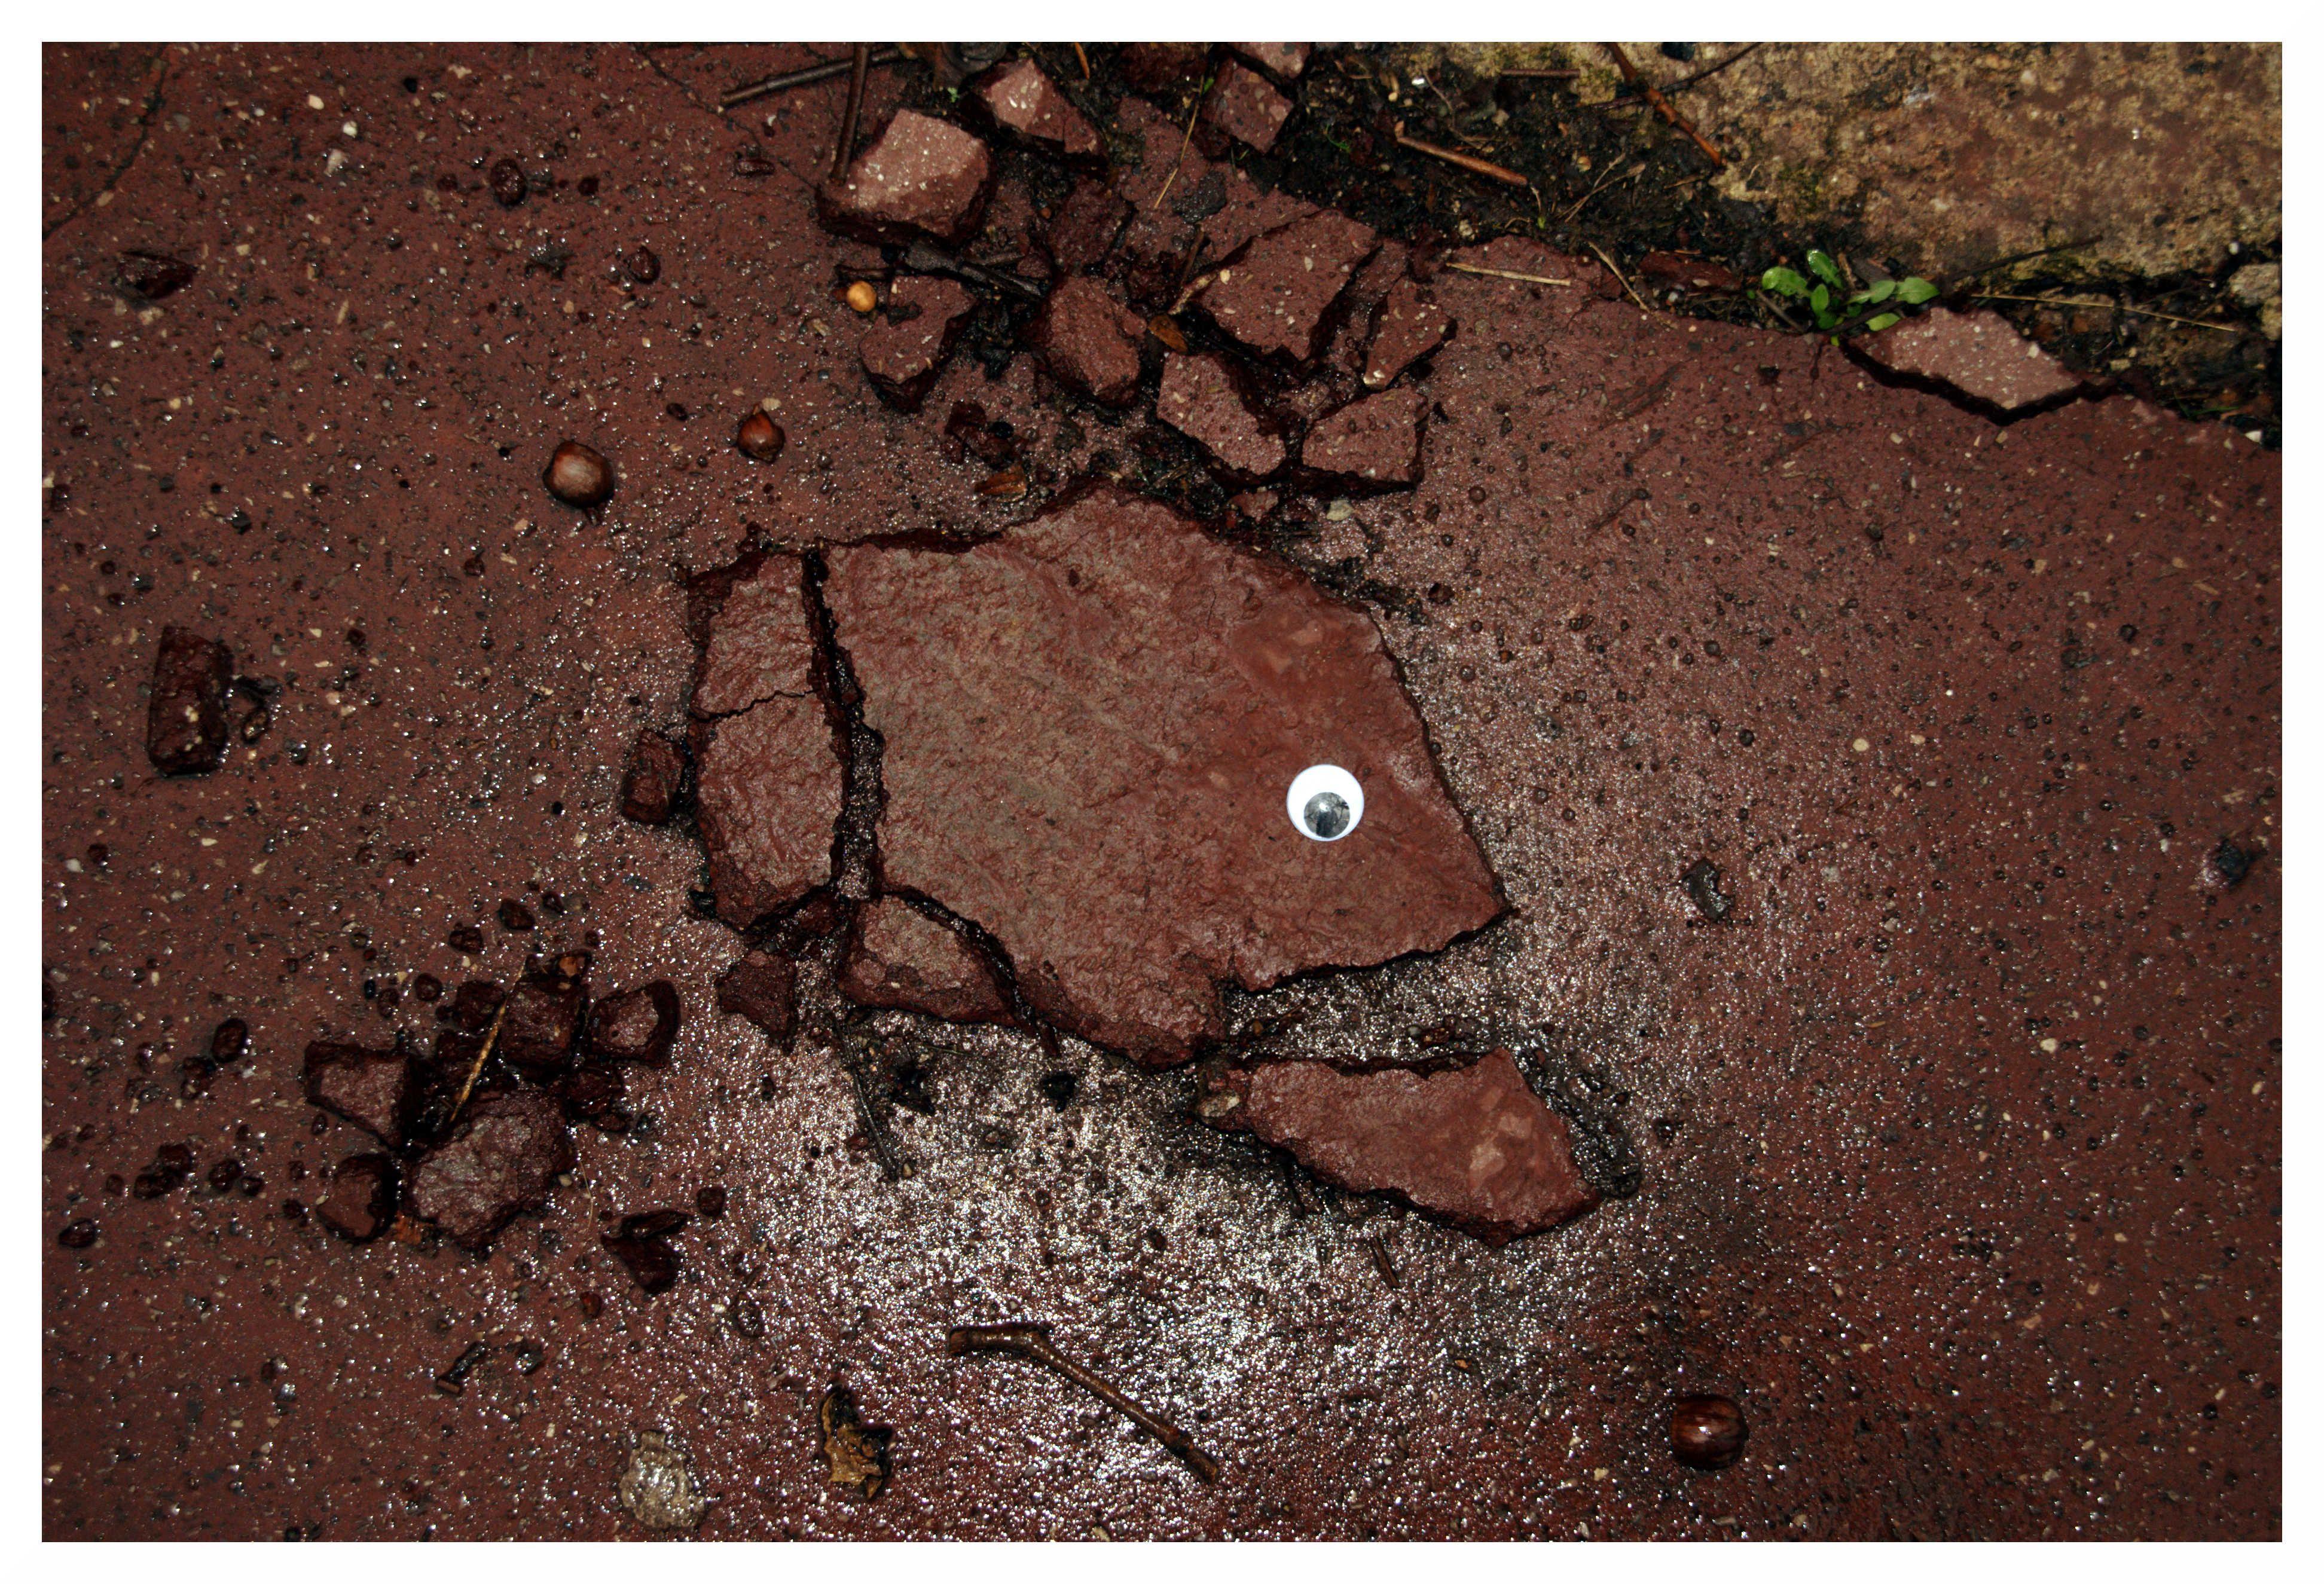 Metamorphosis Eye Bombing  By Ladamenrouge  Street Art  St Etienne : Facebook - Fatcap -Tumblr - Twitter - Flickr - Wix - Youtube